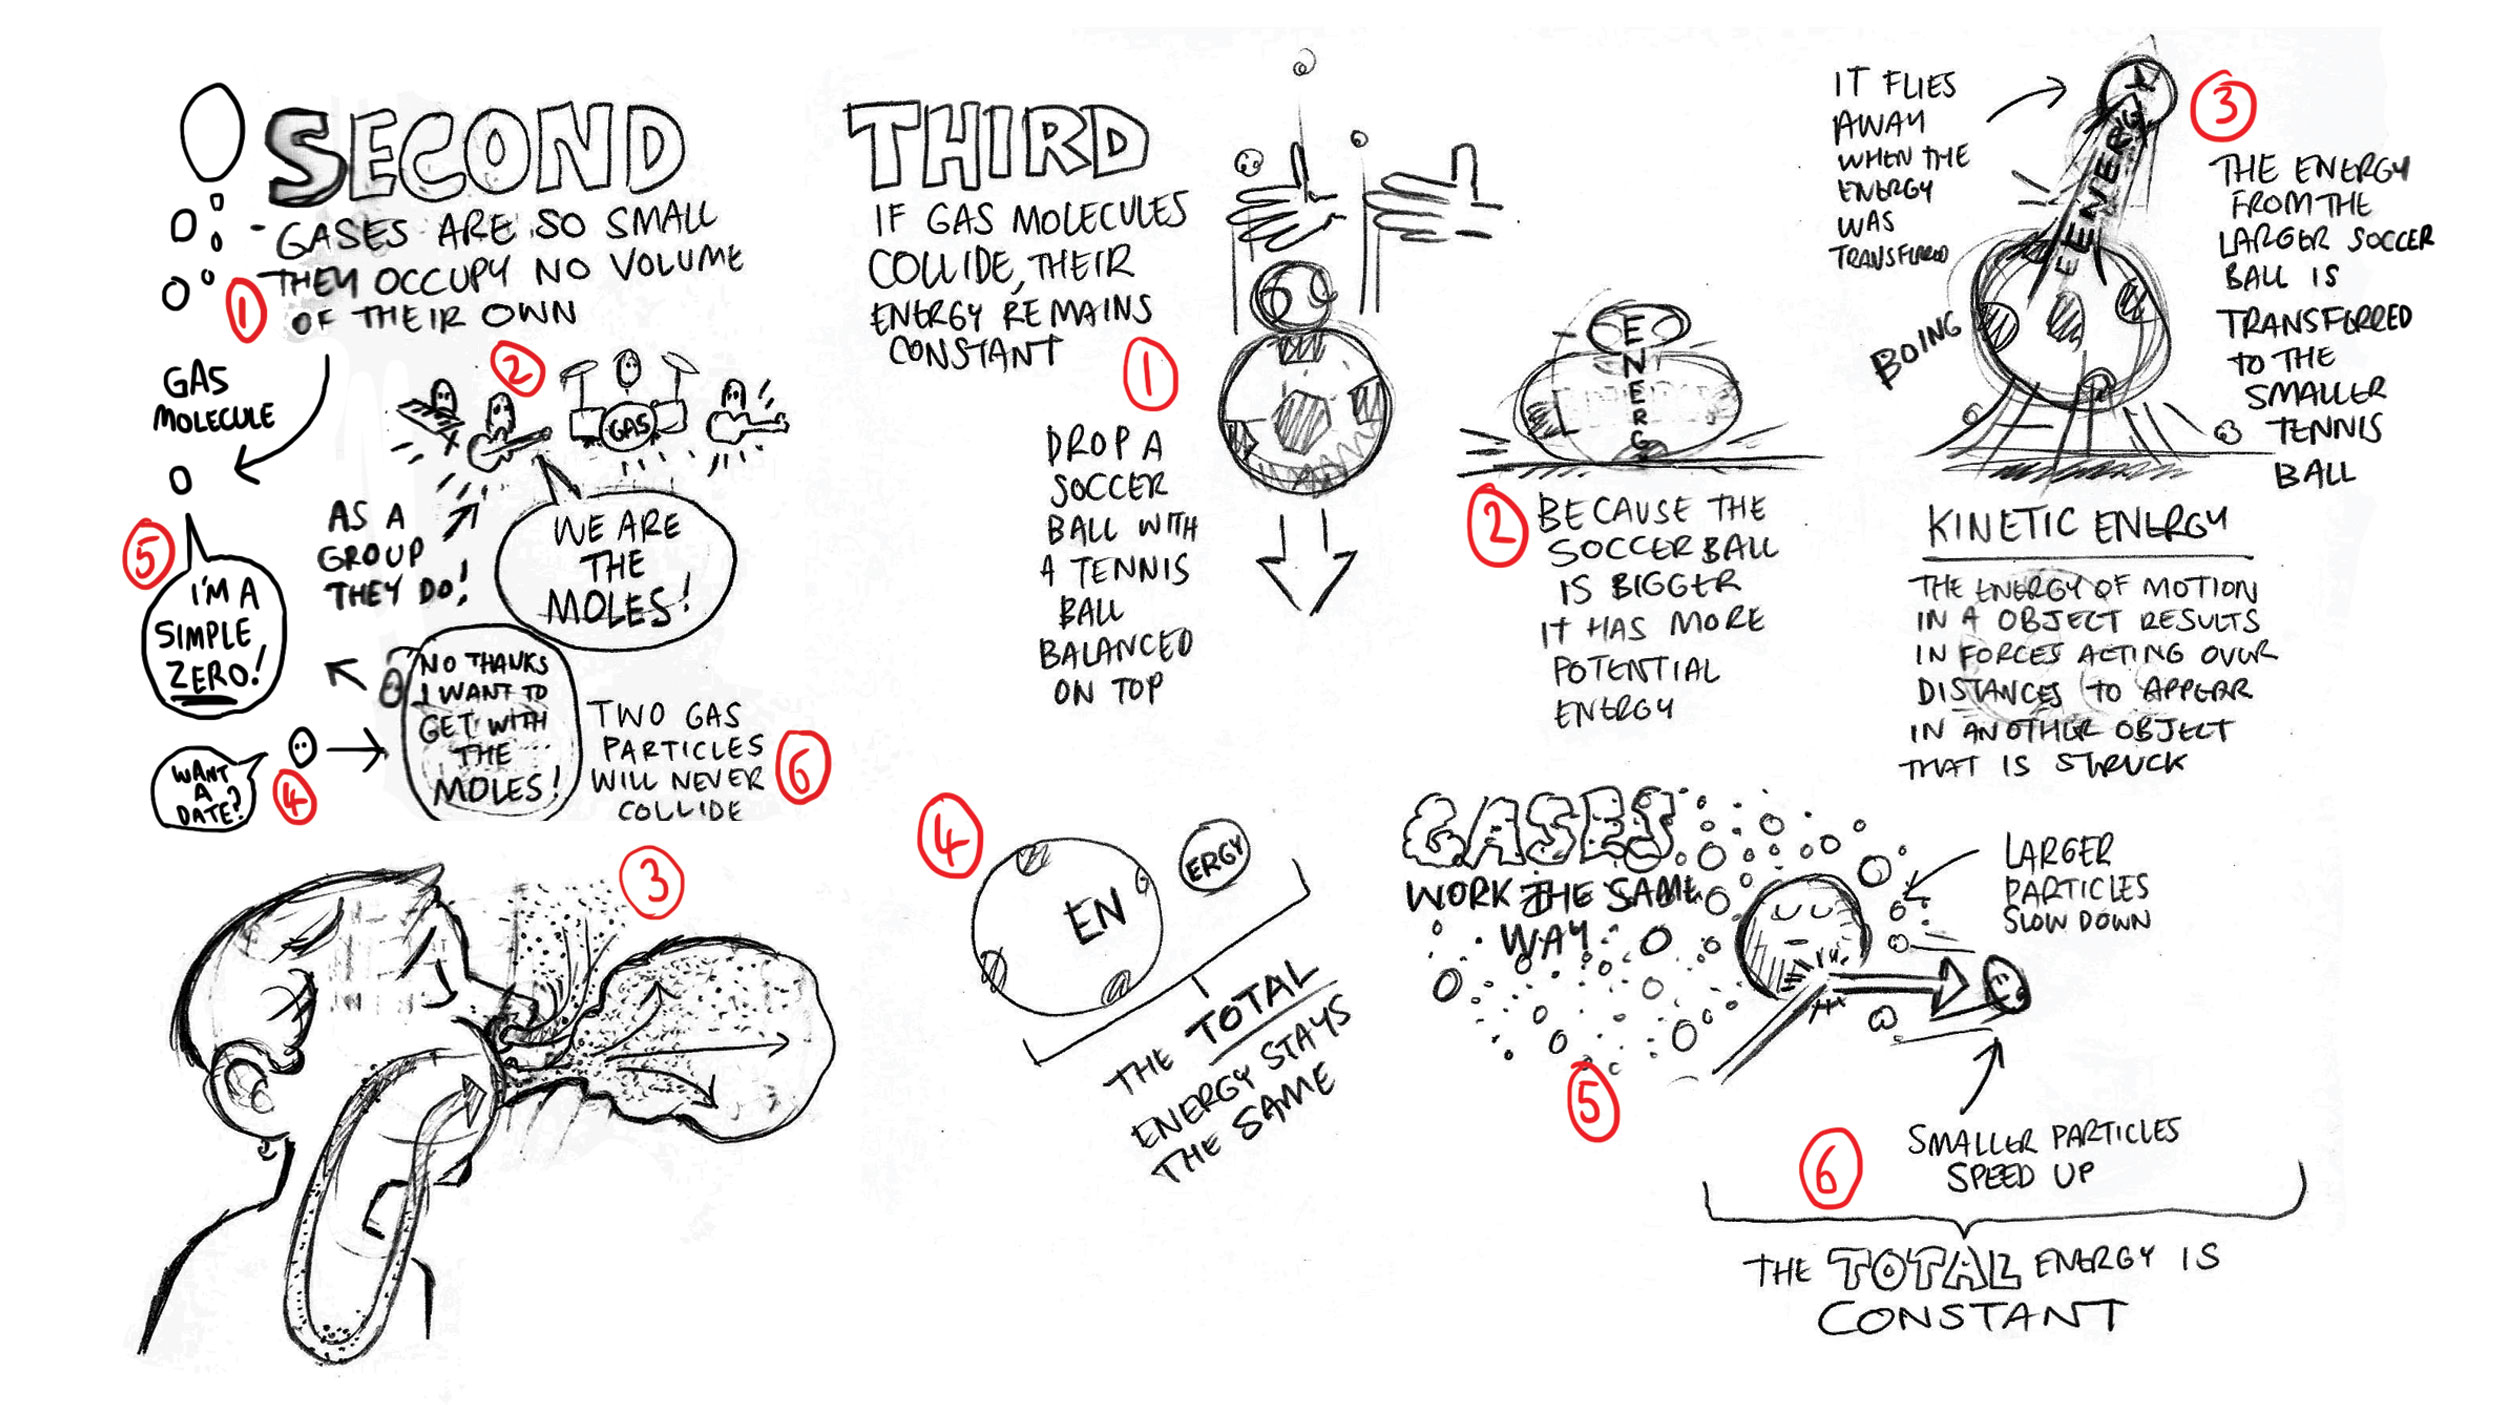 ted-brian-bennett-describing-invisible-properties-gas-cognitive-02.jpg